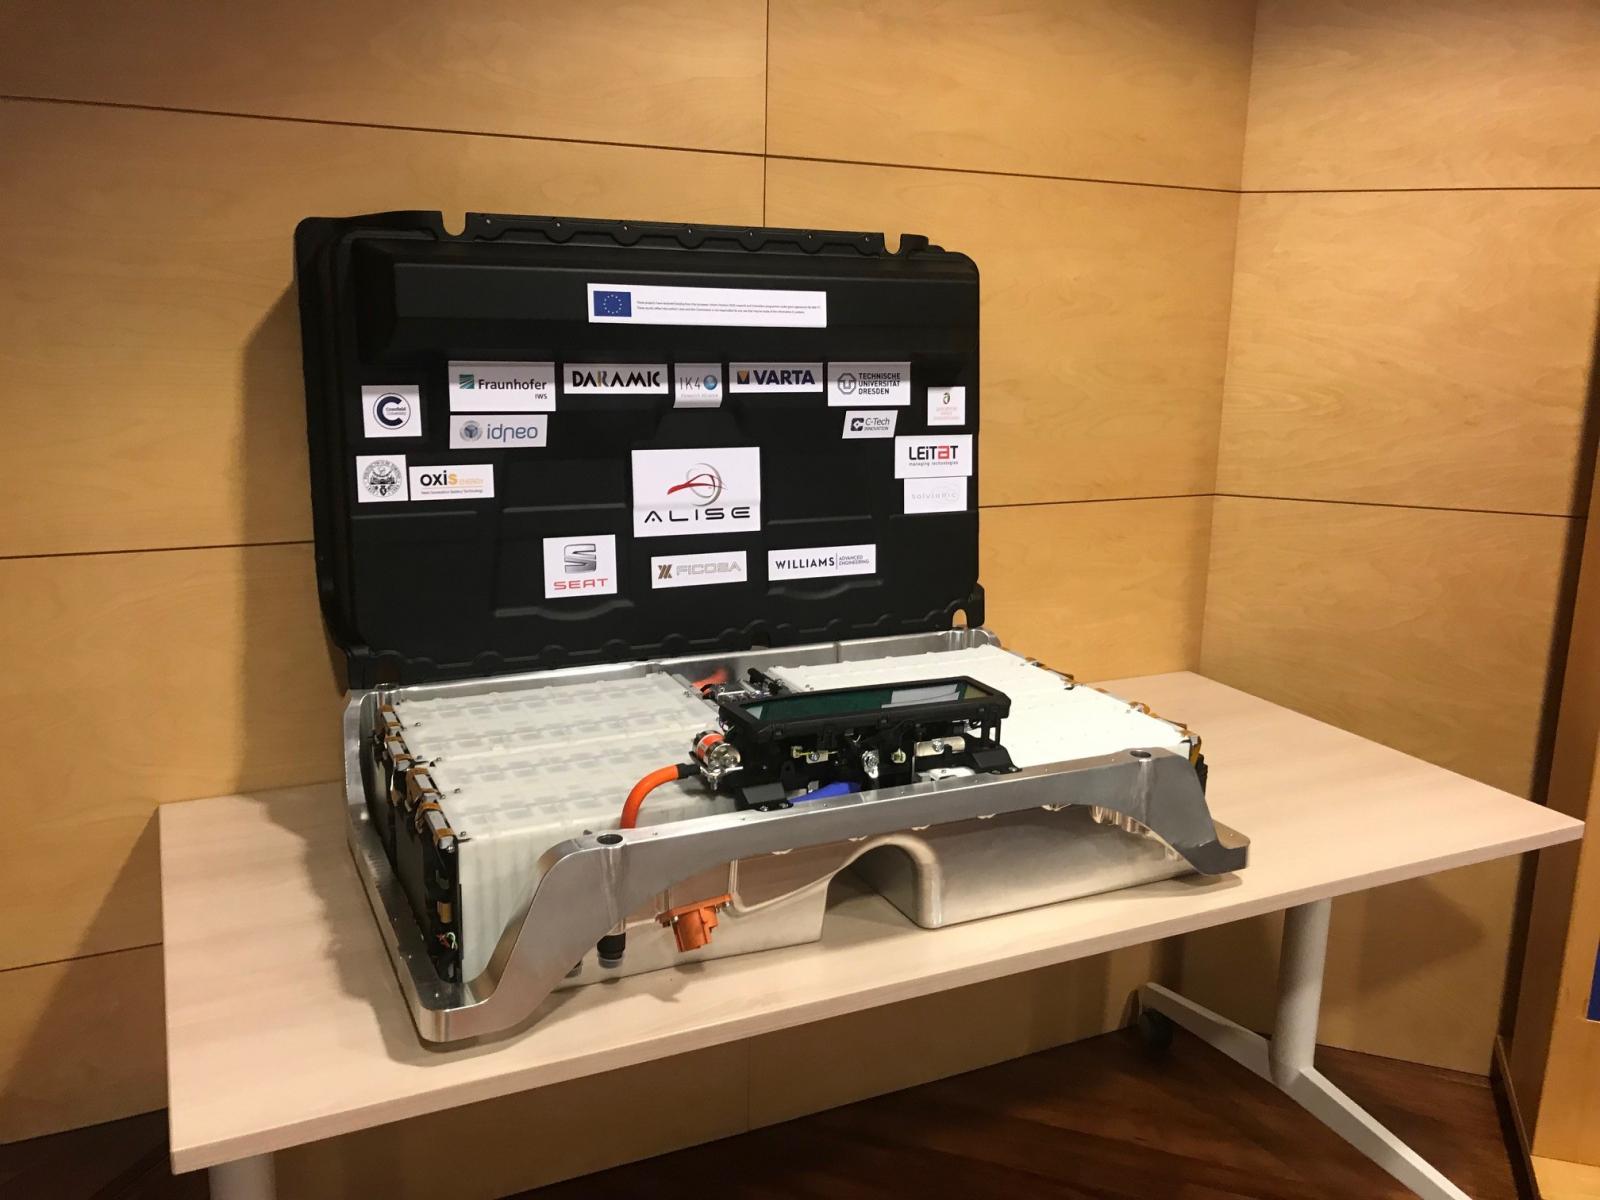 La nova bateria elèctrica desenvolupada pel consorci europeu